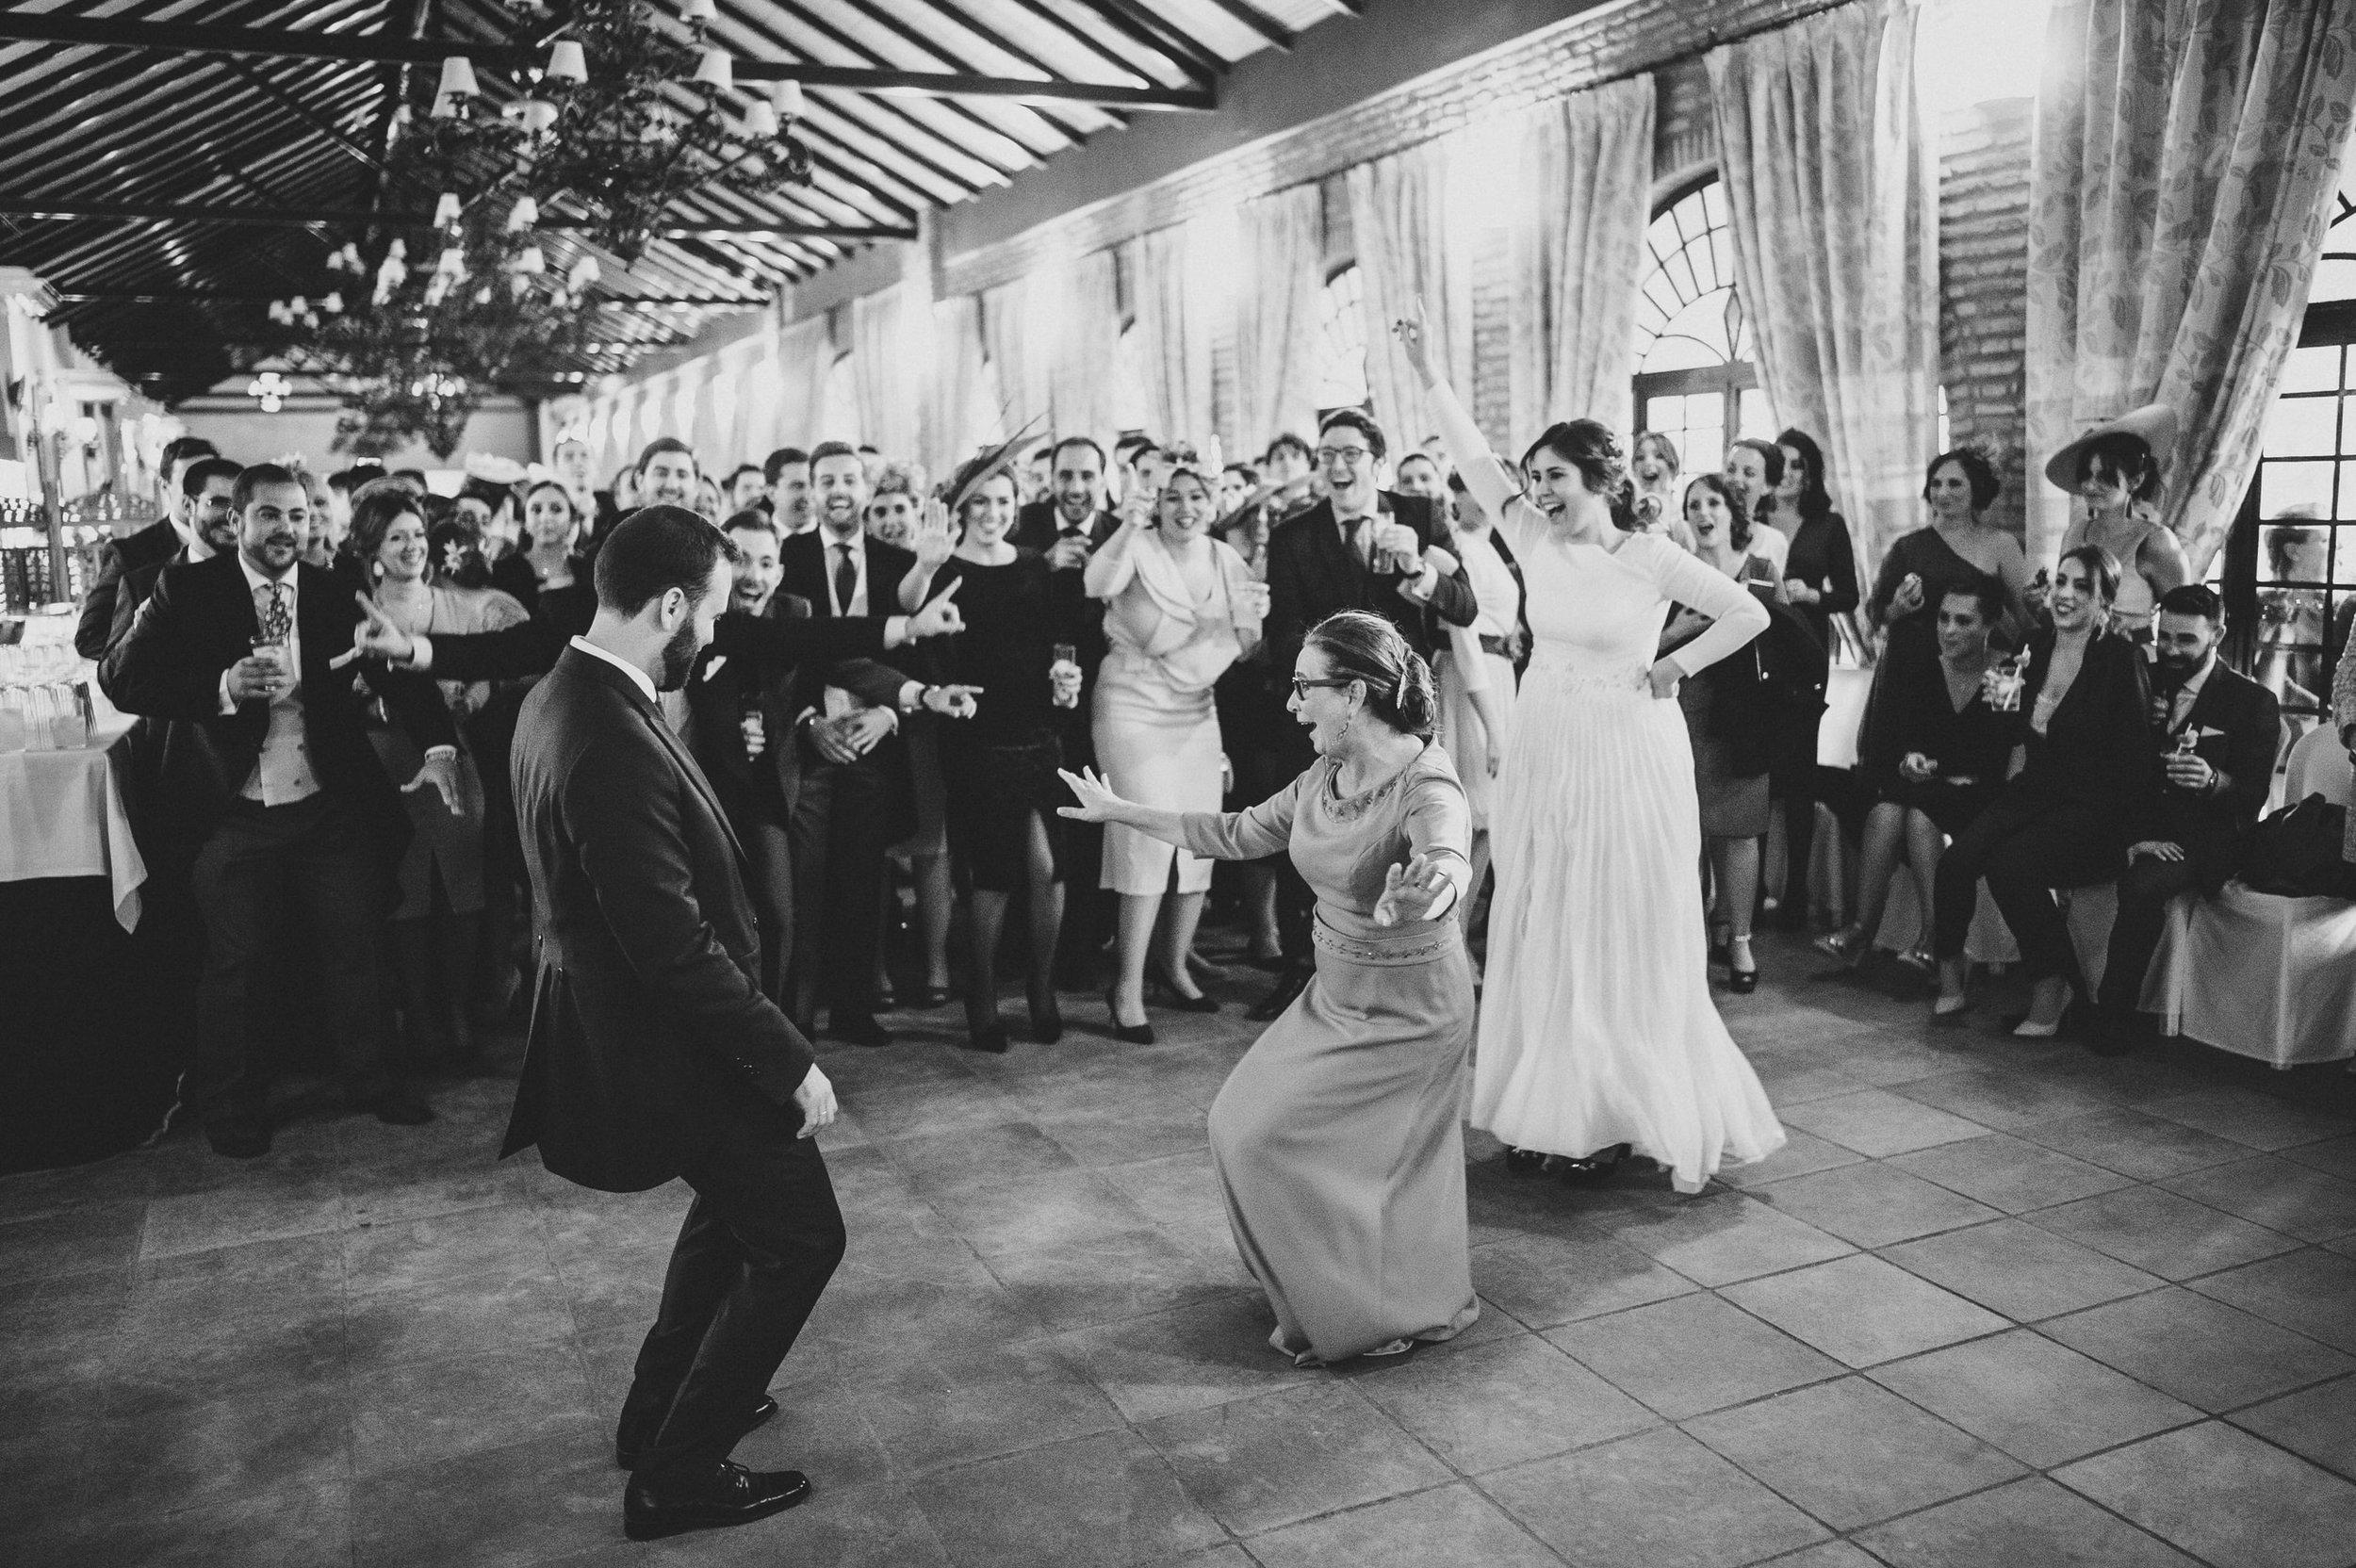 andres+amarillo+fotografo+boda+sevilla+santa+maria+de+la+blanca+al+yamanah (24).JPG